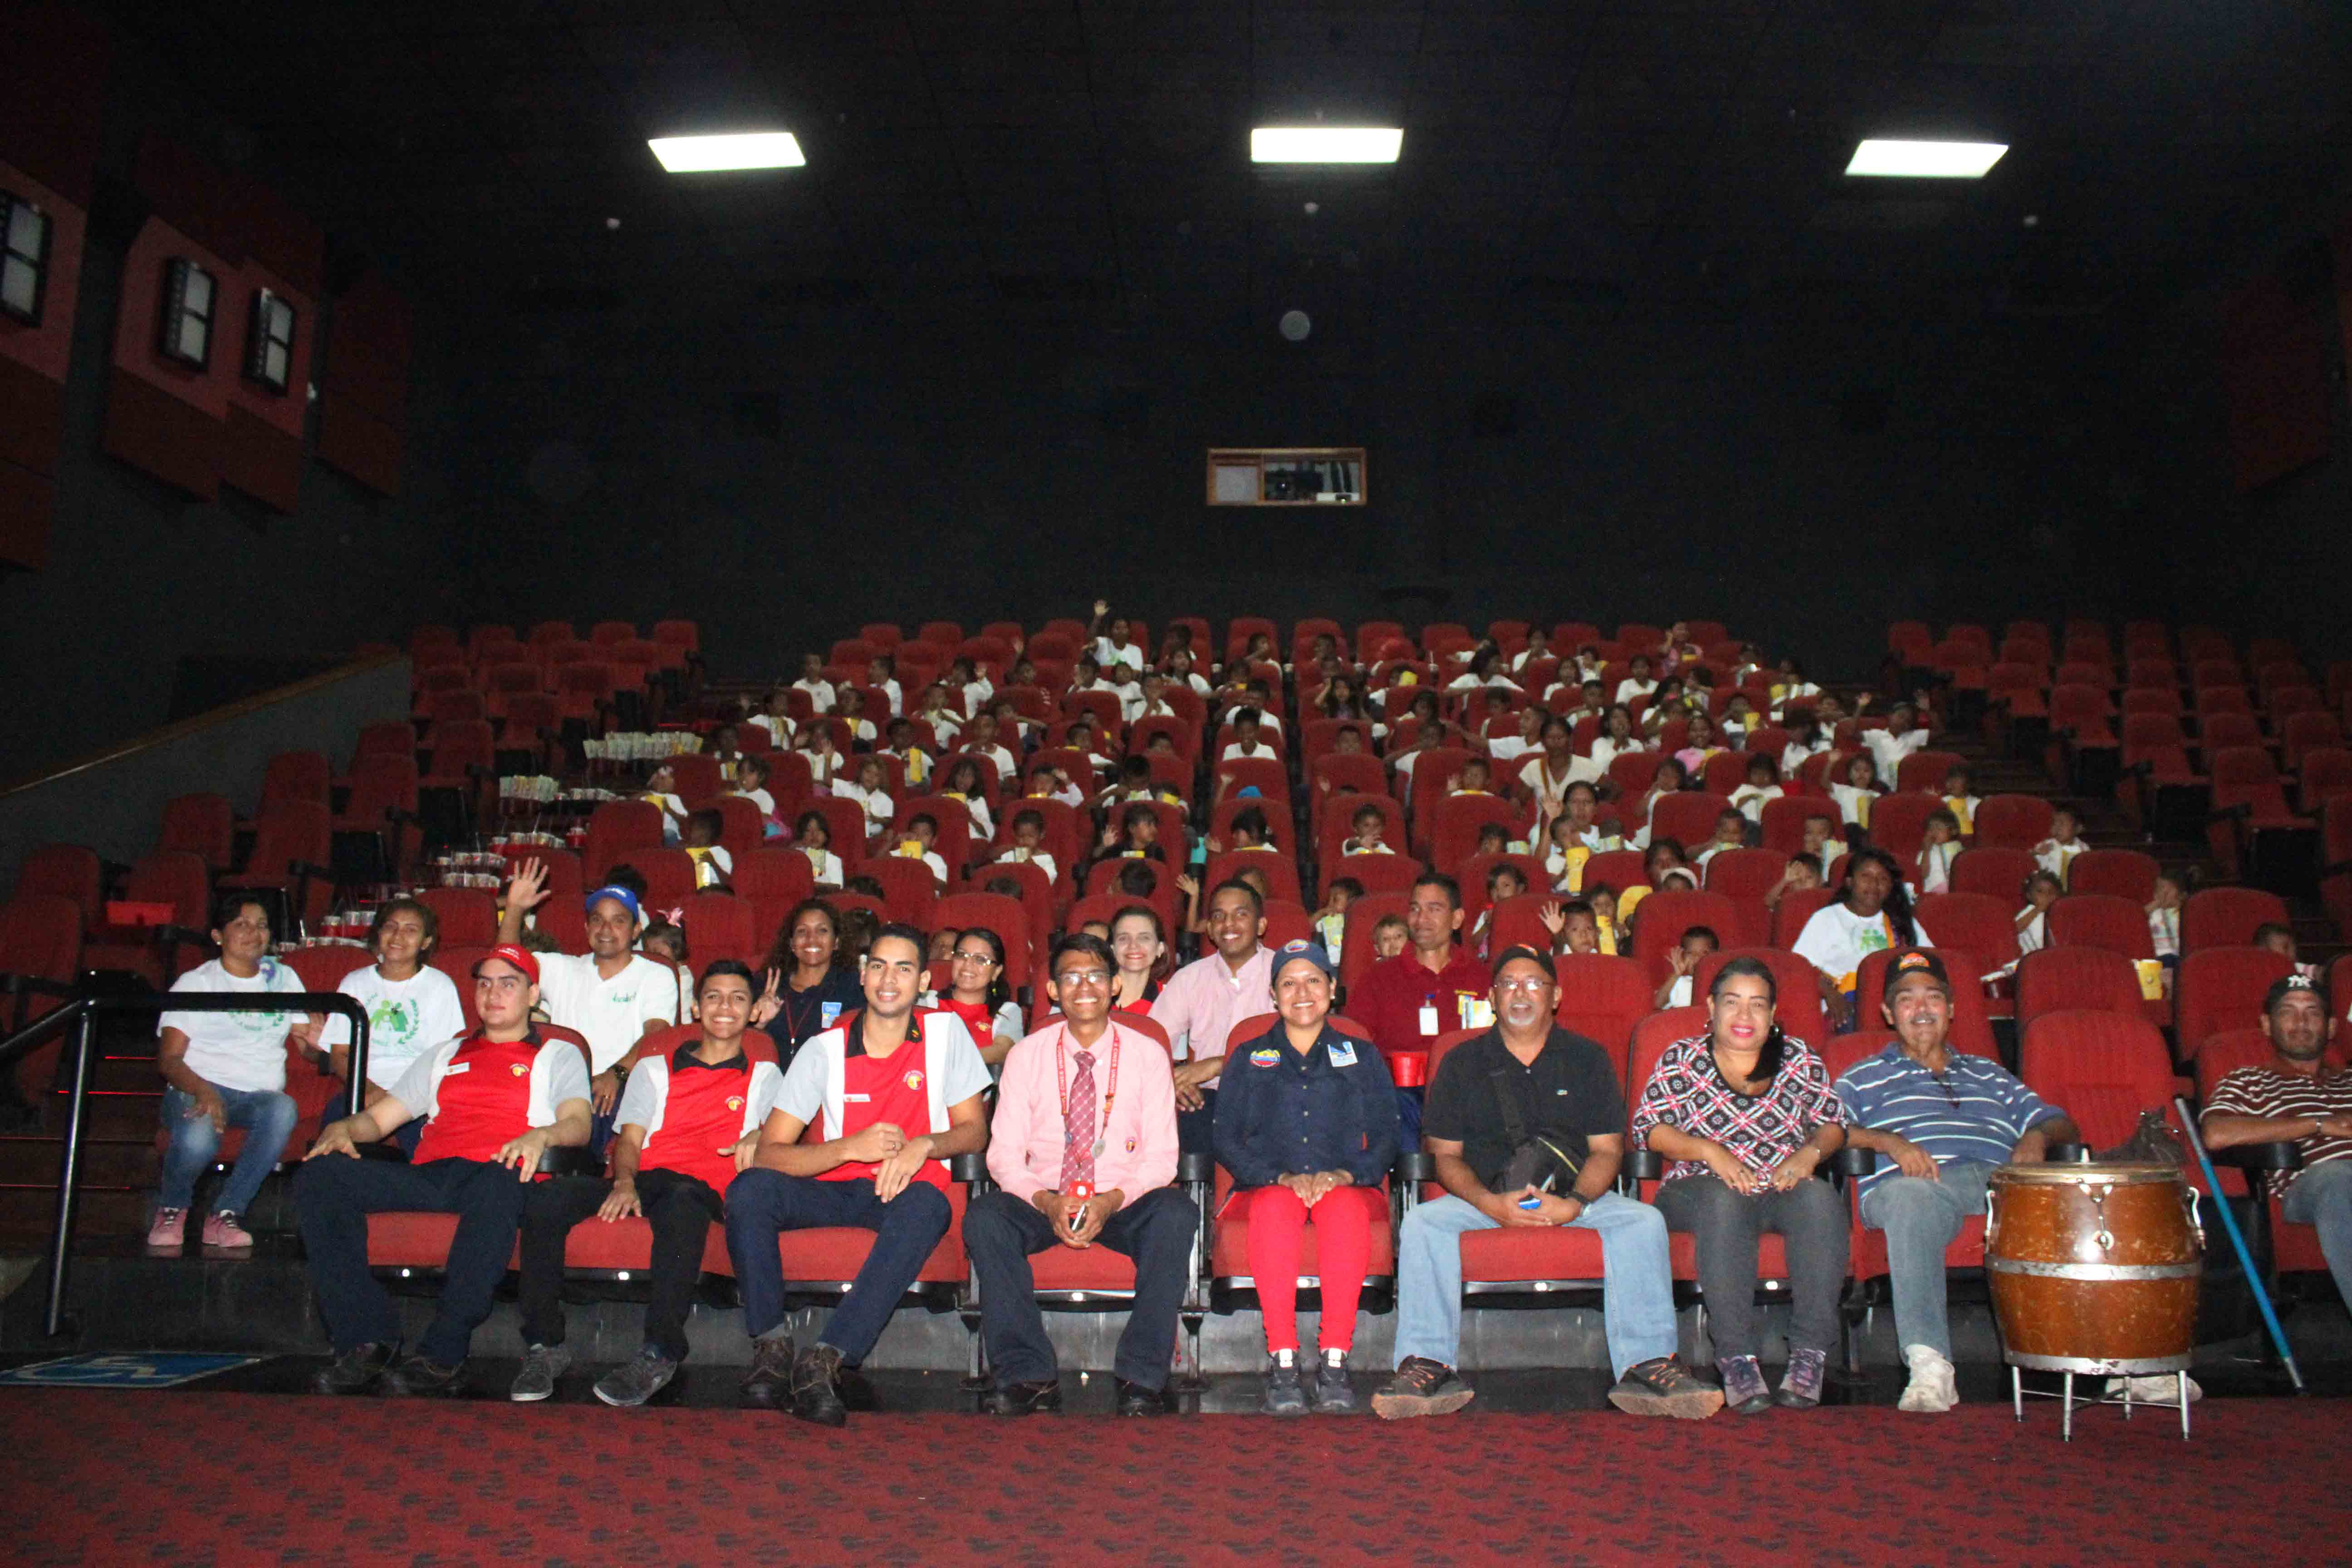 Gmcp garantiza Navidades Felices a través de cine-foro y entrega de juguetes (17)